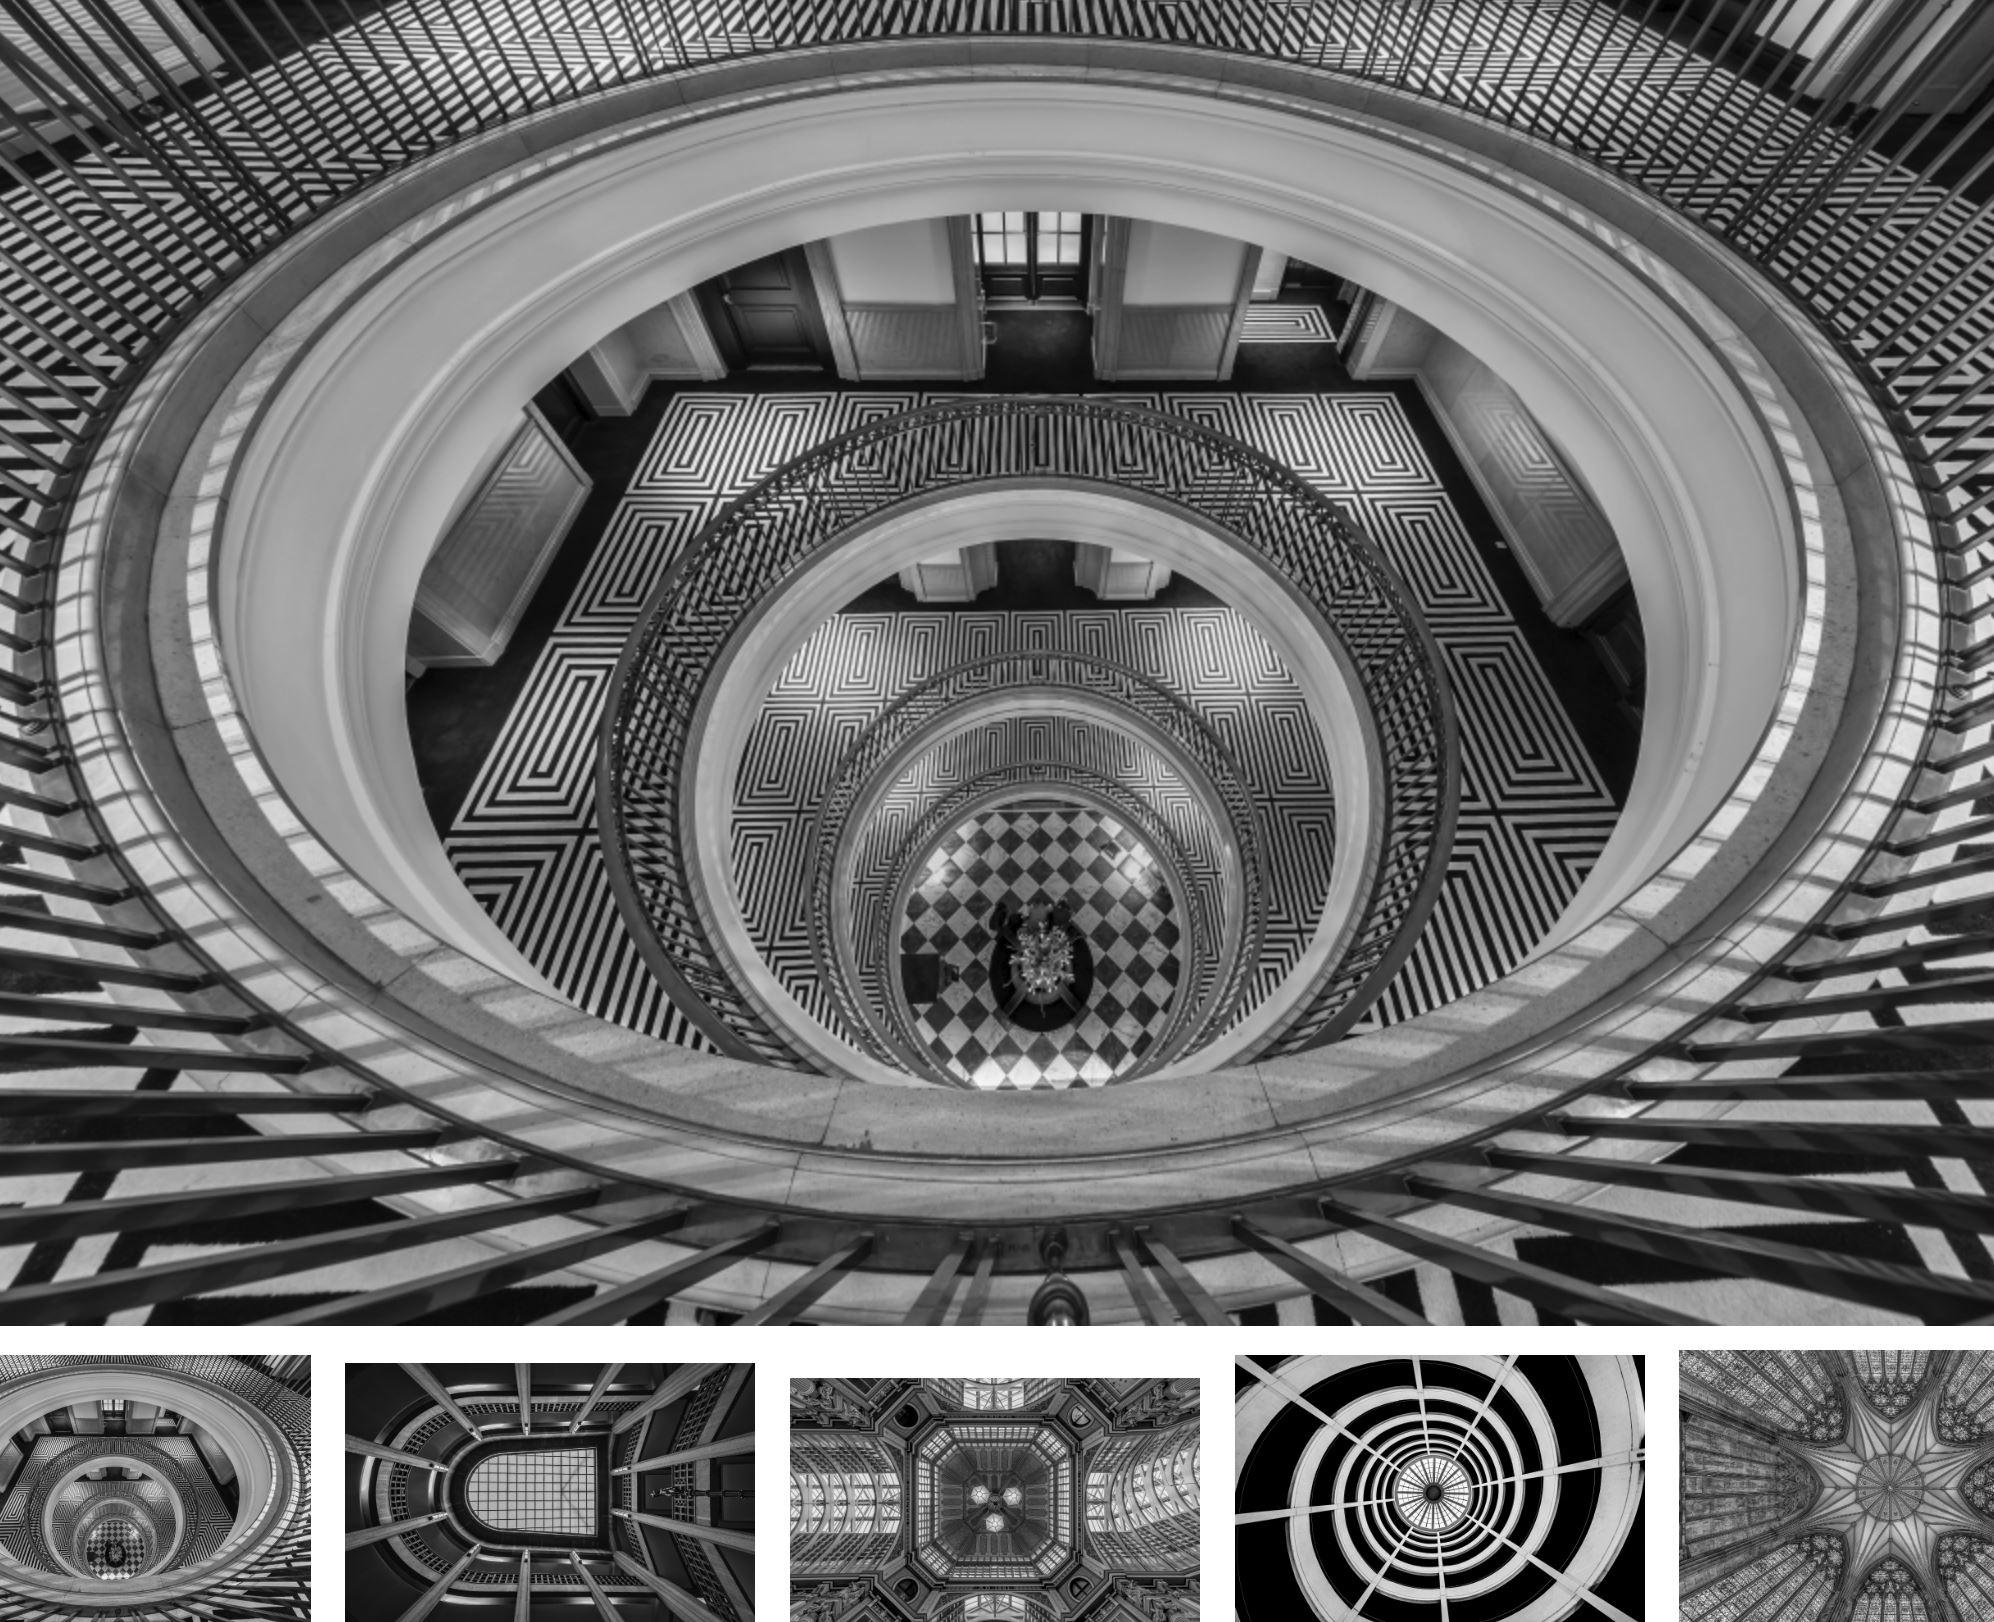 SilkeTüxenPhotographyFAPA 2018 2019 Architectural Style 14.04.JPG